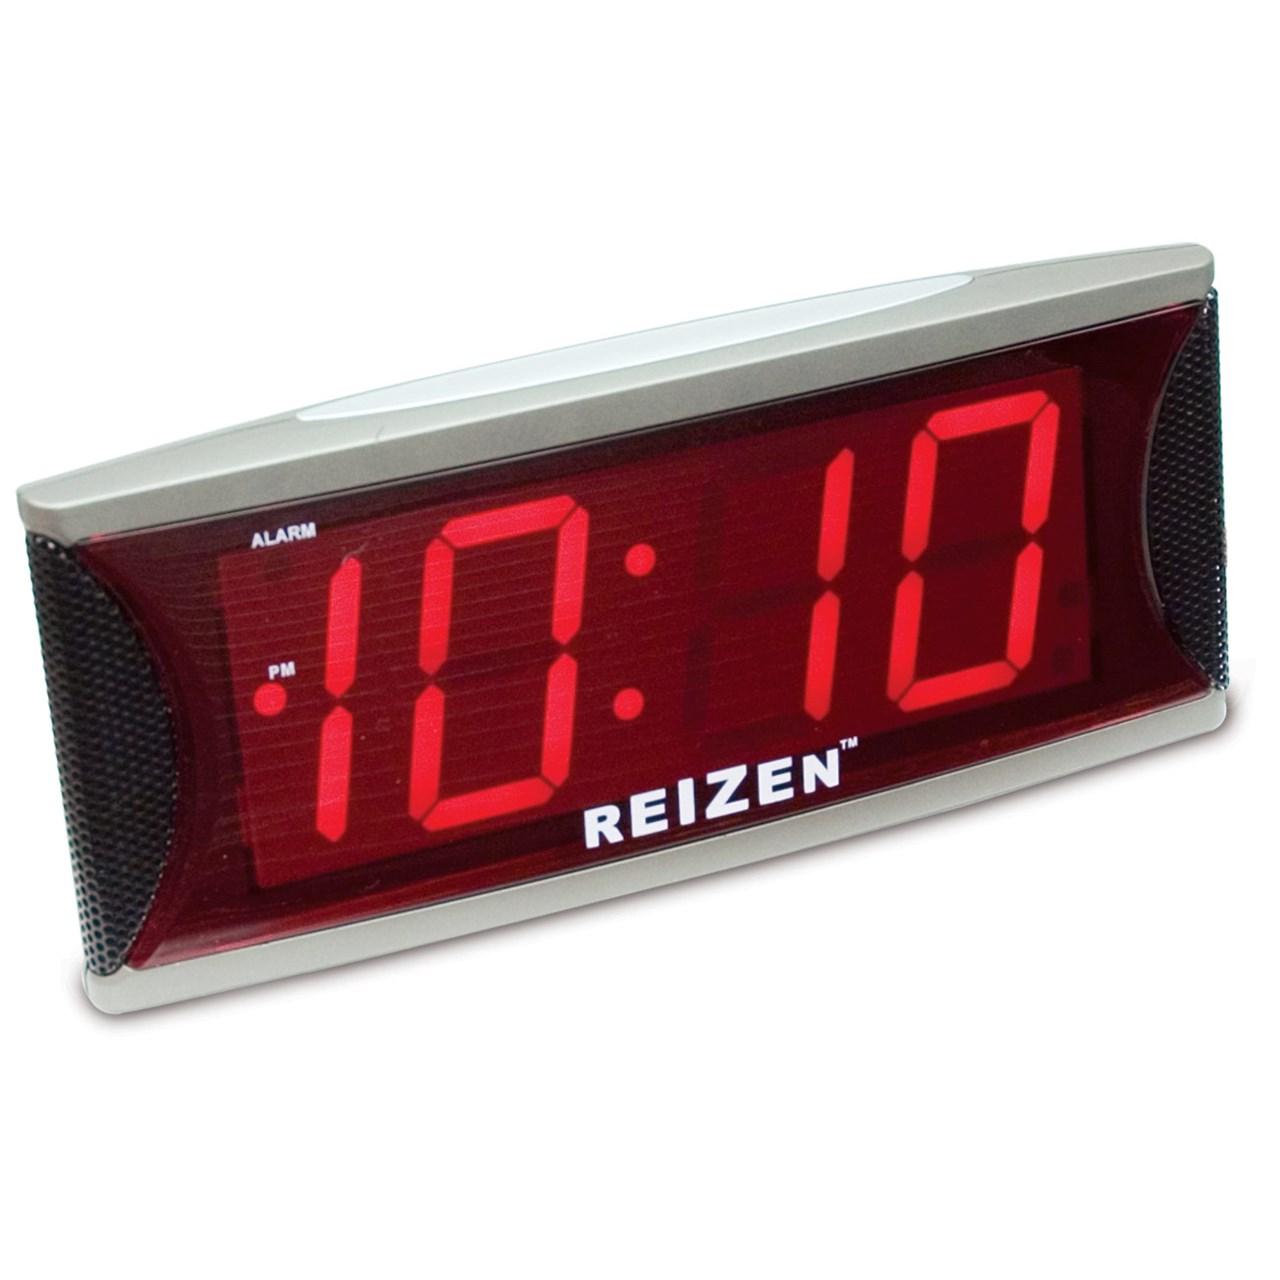 Reizen Jumbo Super Loud Alarm Clock with 2-Inch Red LED